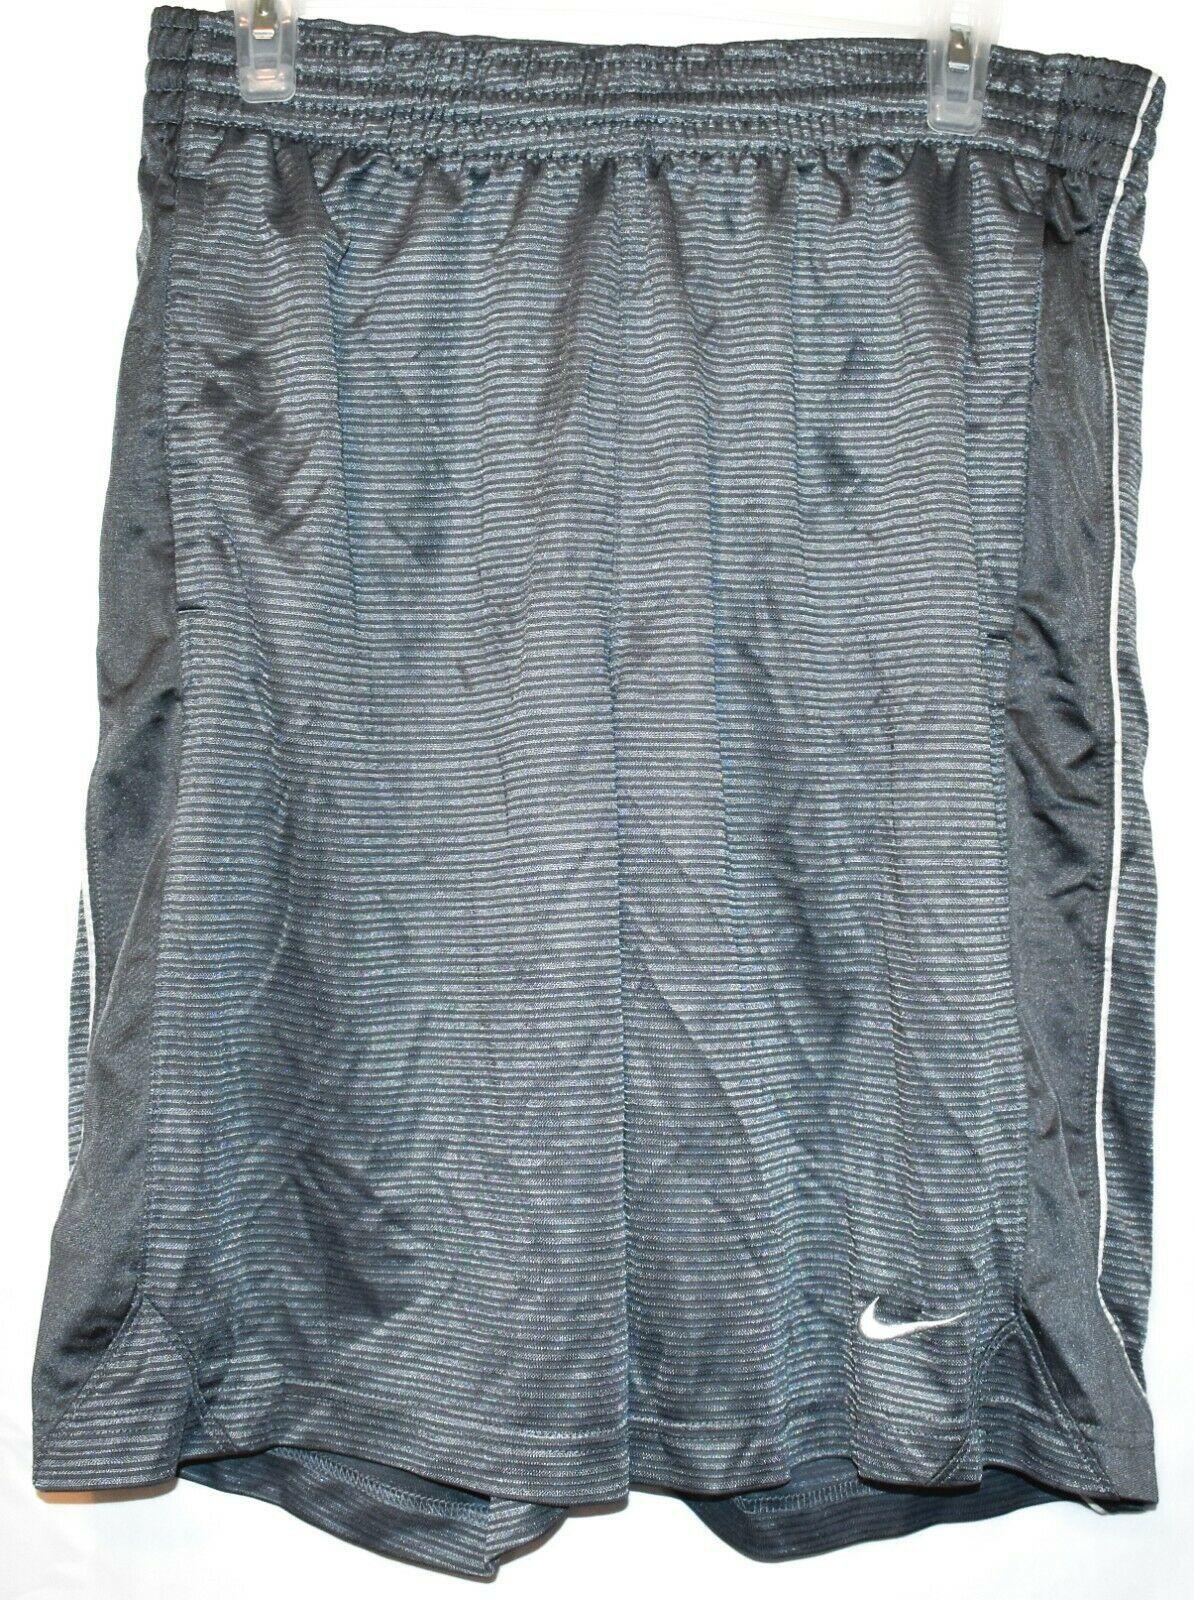 Nike Layup Men's Gray Basketball Athletic Swoosh Shorts Size M